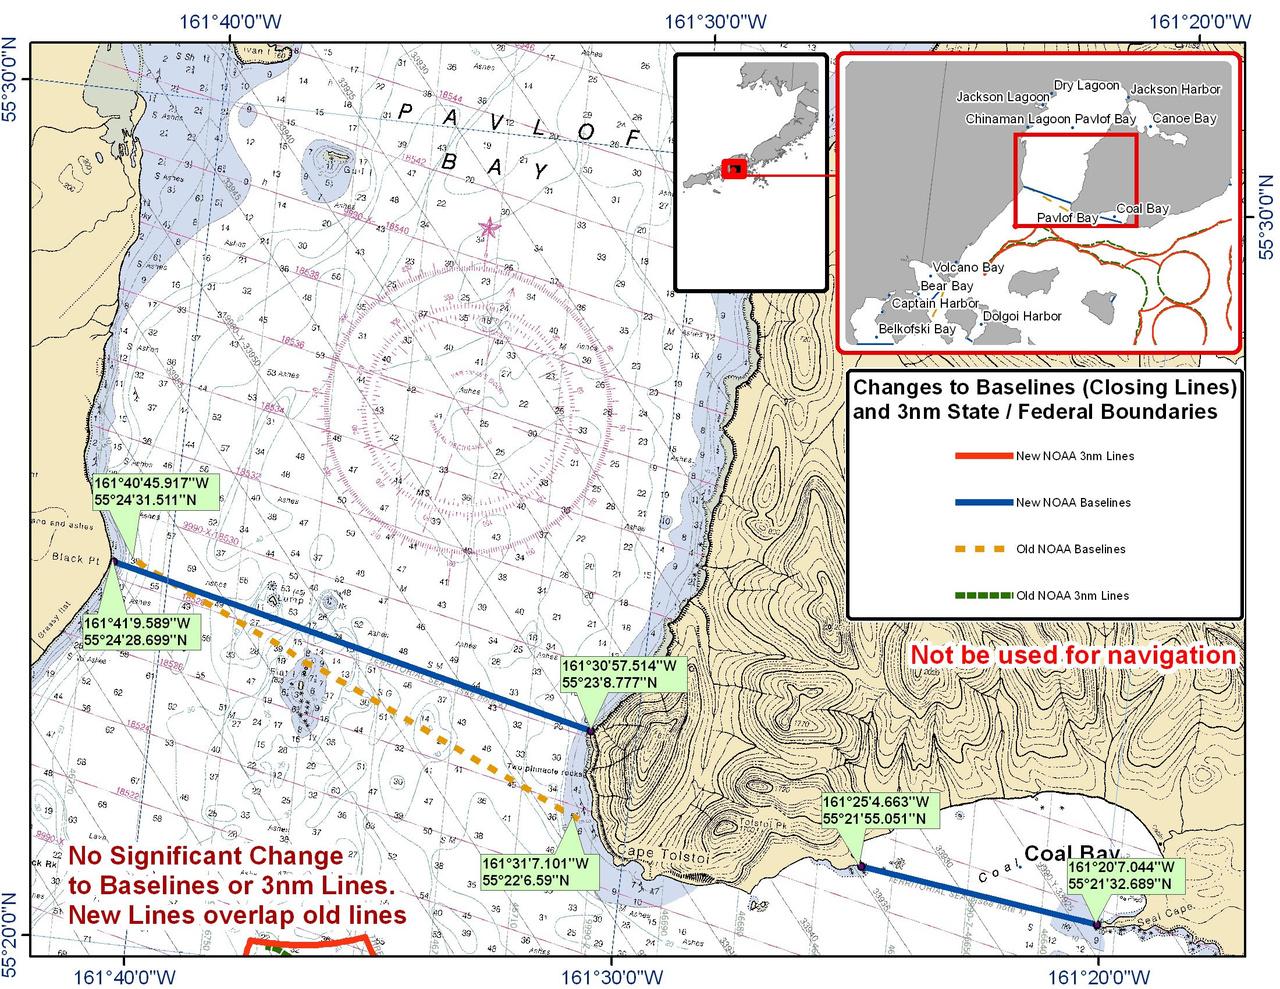 Chart for Pavlof Bay and Coal Bay